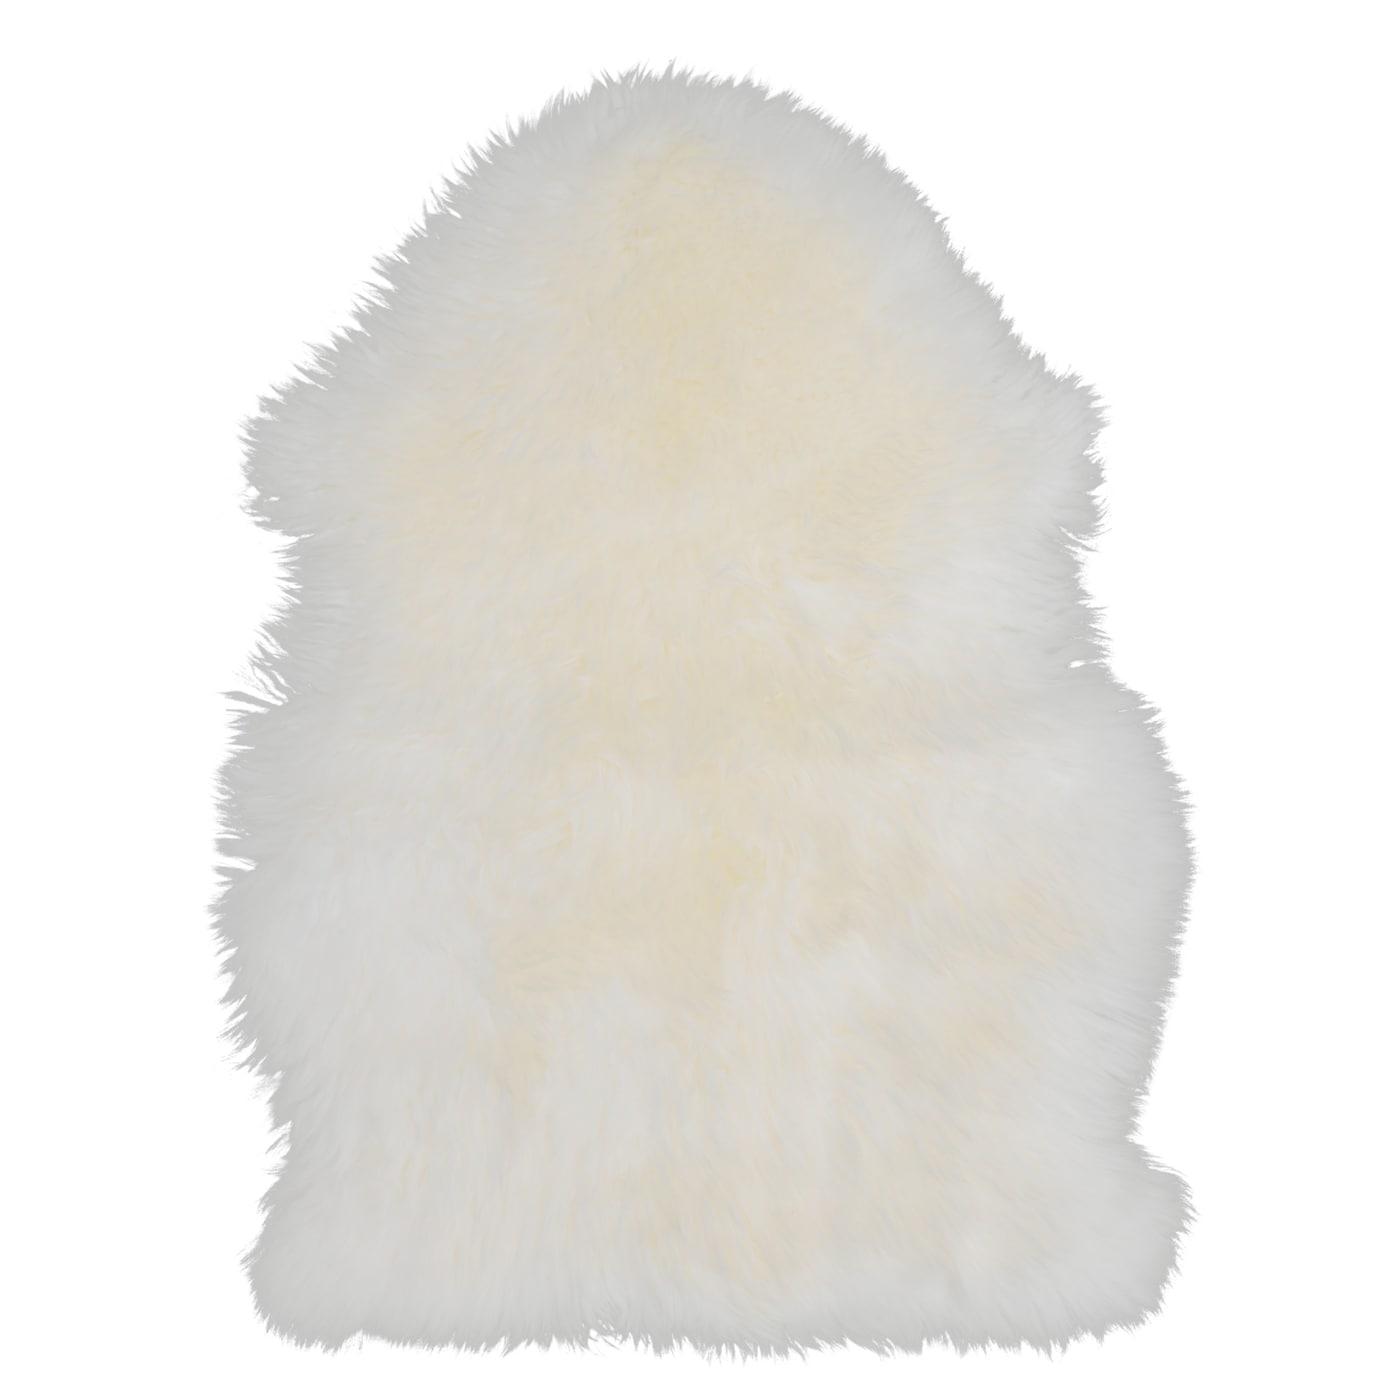 Skold Sheepskin White 60 Cm Ikea